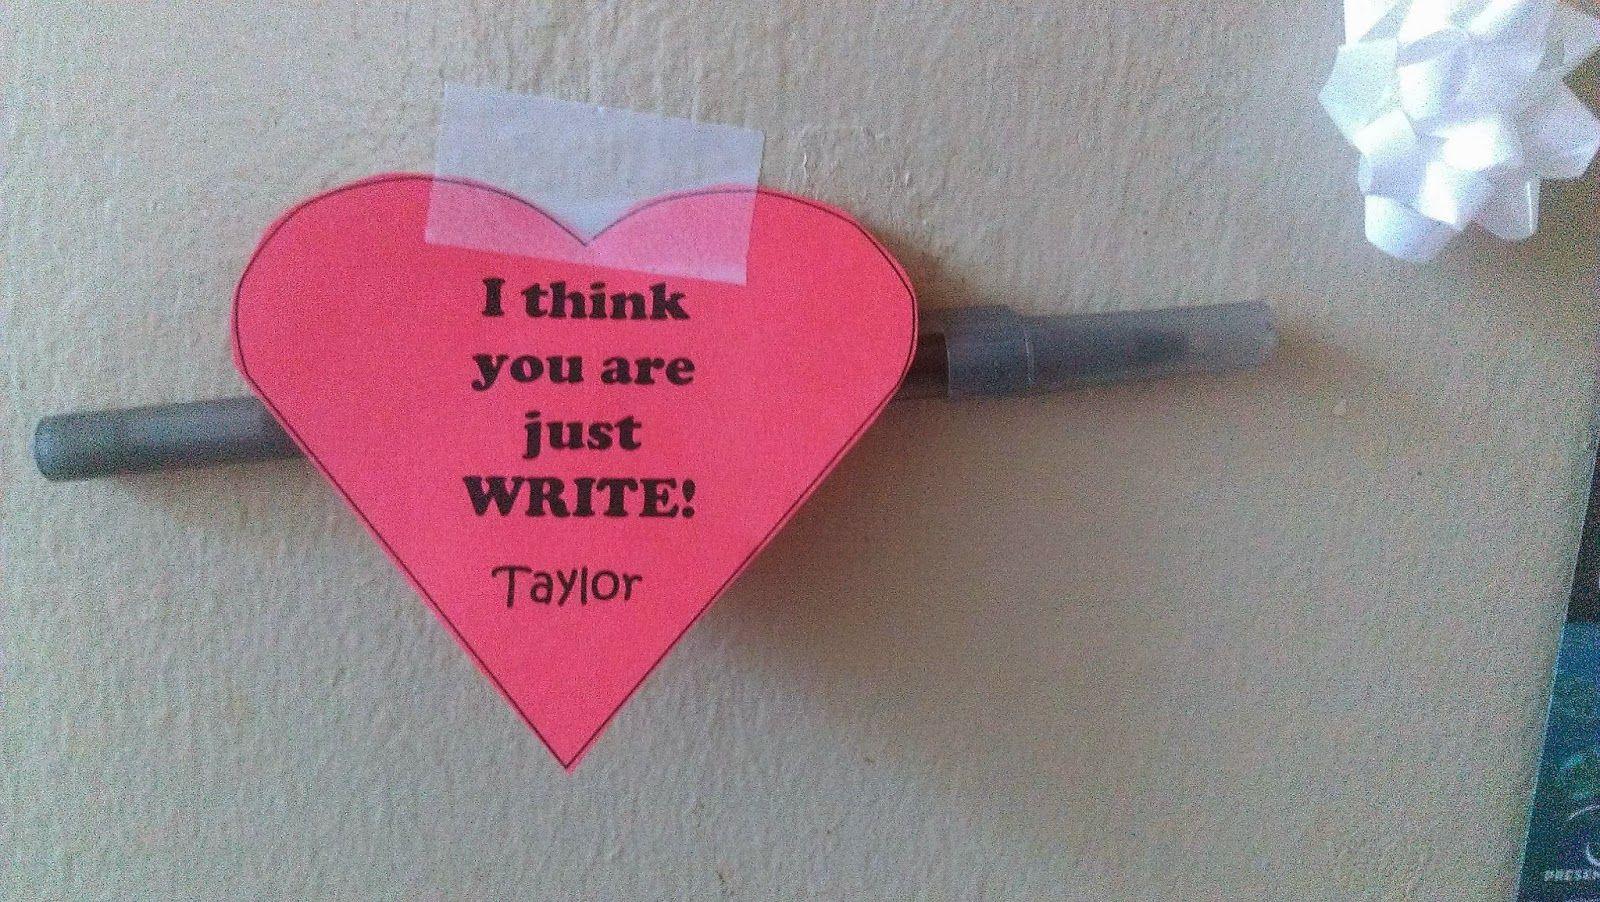 """I think that you are just WRITE"" Valentine's Day passive #ra #passives #programs #residentassistant #residentadvisor #valentinesday"